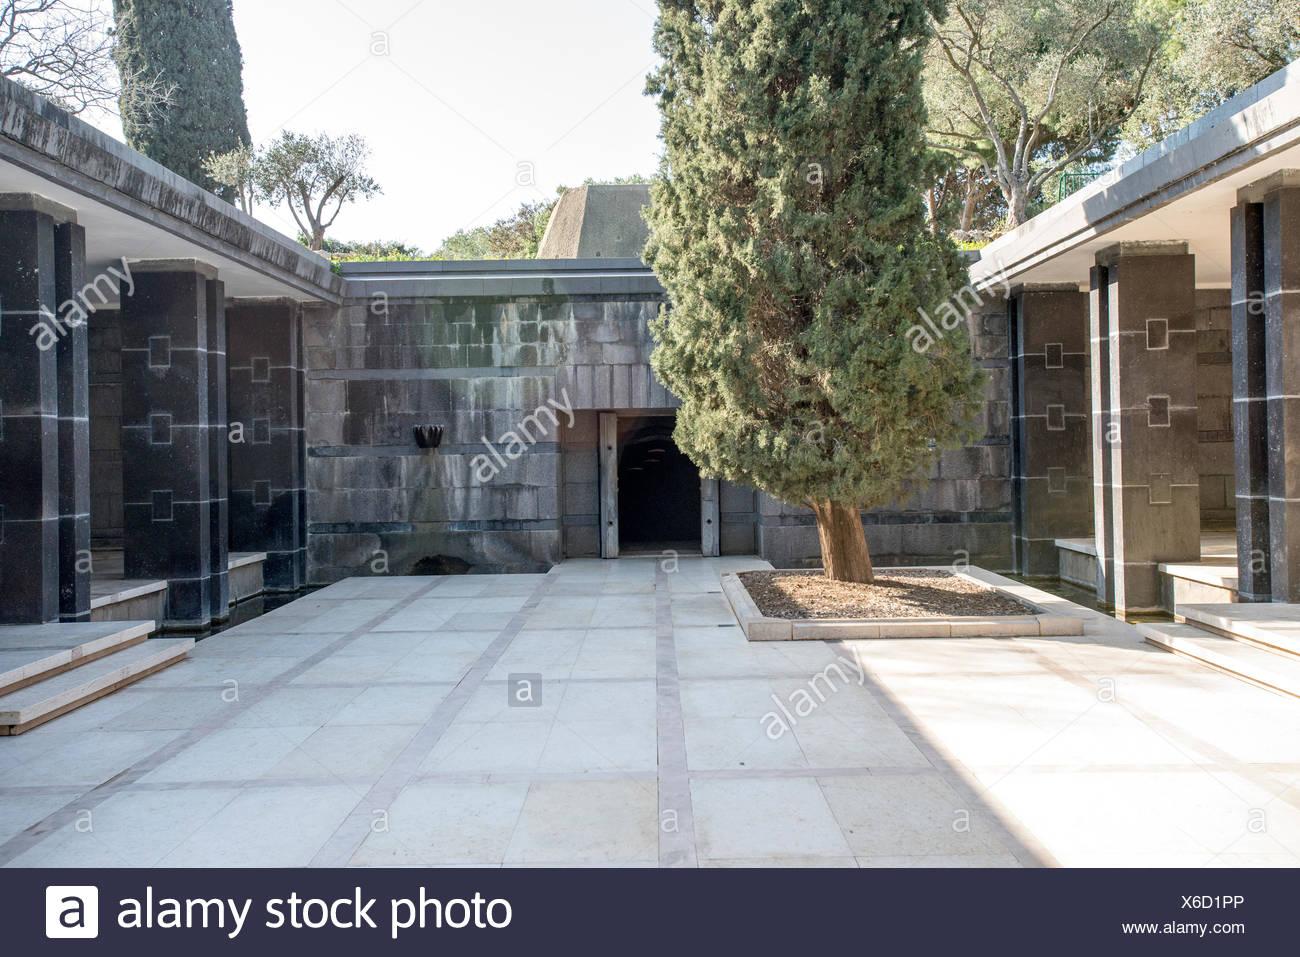 Rothschild family tomb, Israel, Mount Carmel, Ramat Hanadiv gardens near Zichron Ya'acov - Stock Image